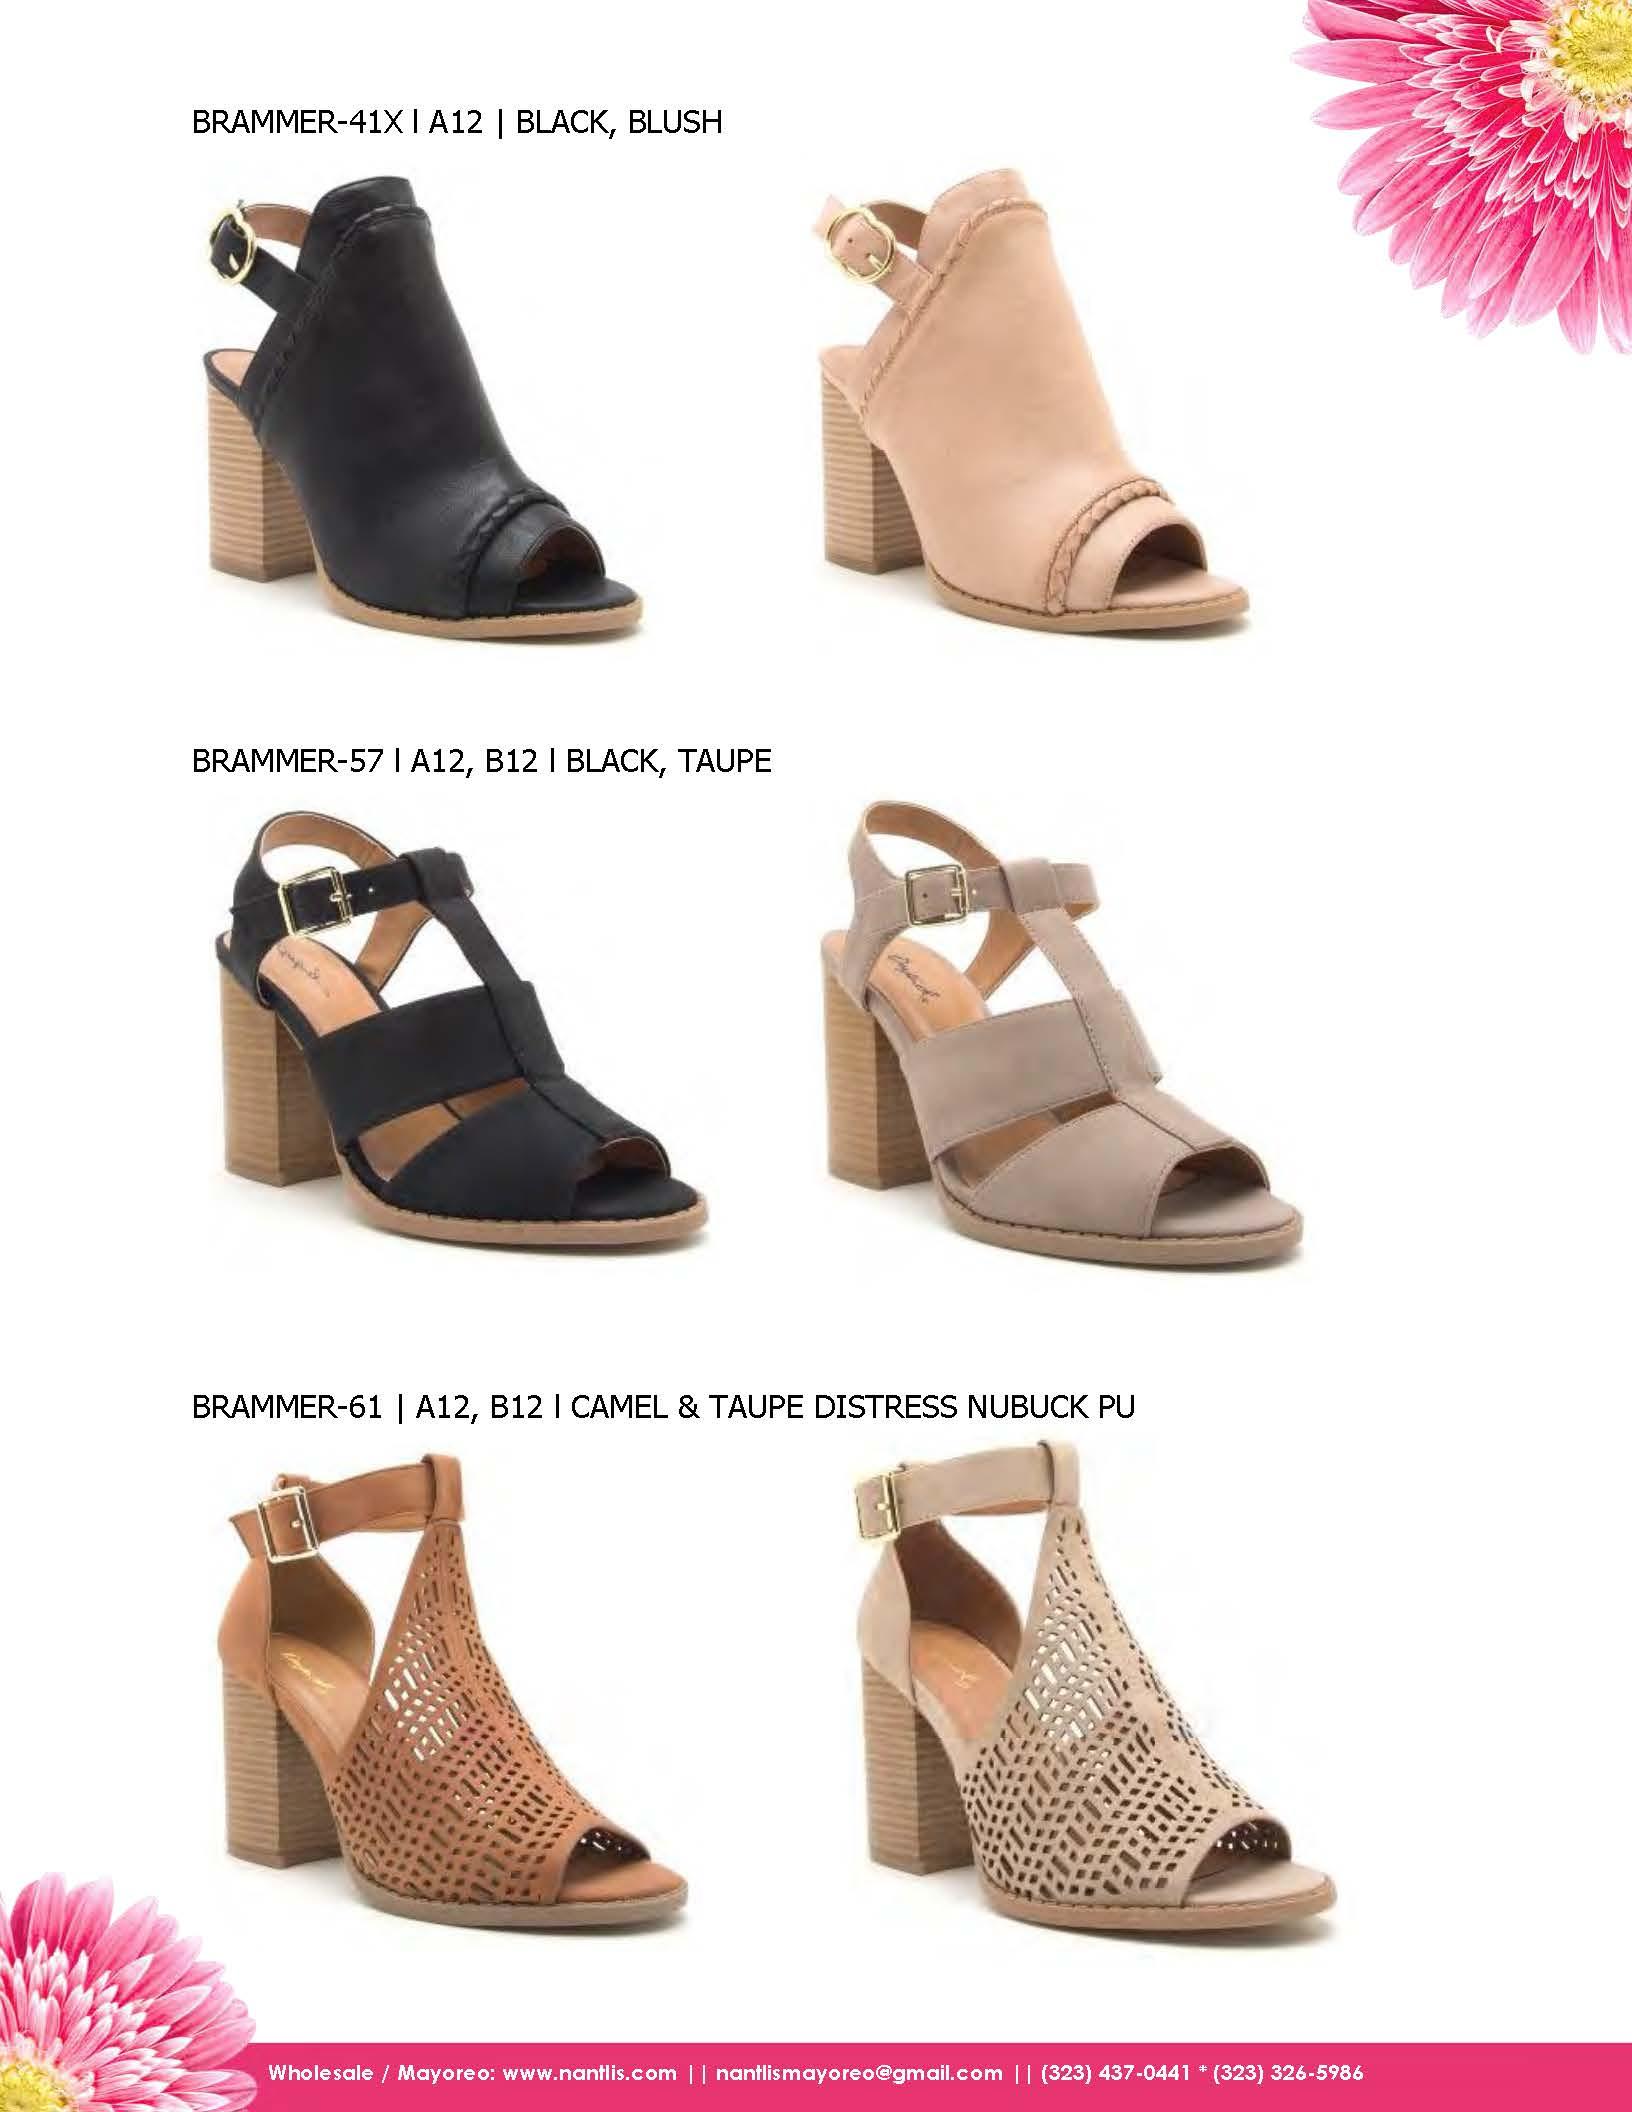 Nantlis Vol QU43 Zapatos para mujer mayoreo Wholesale shoes for women_Page_07